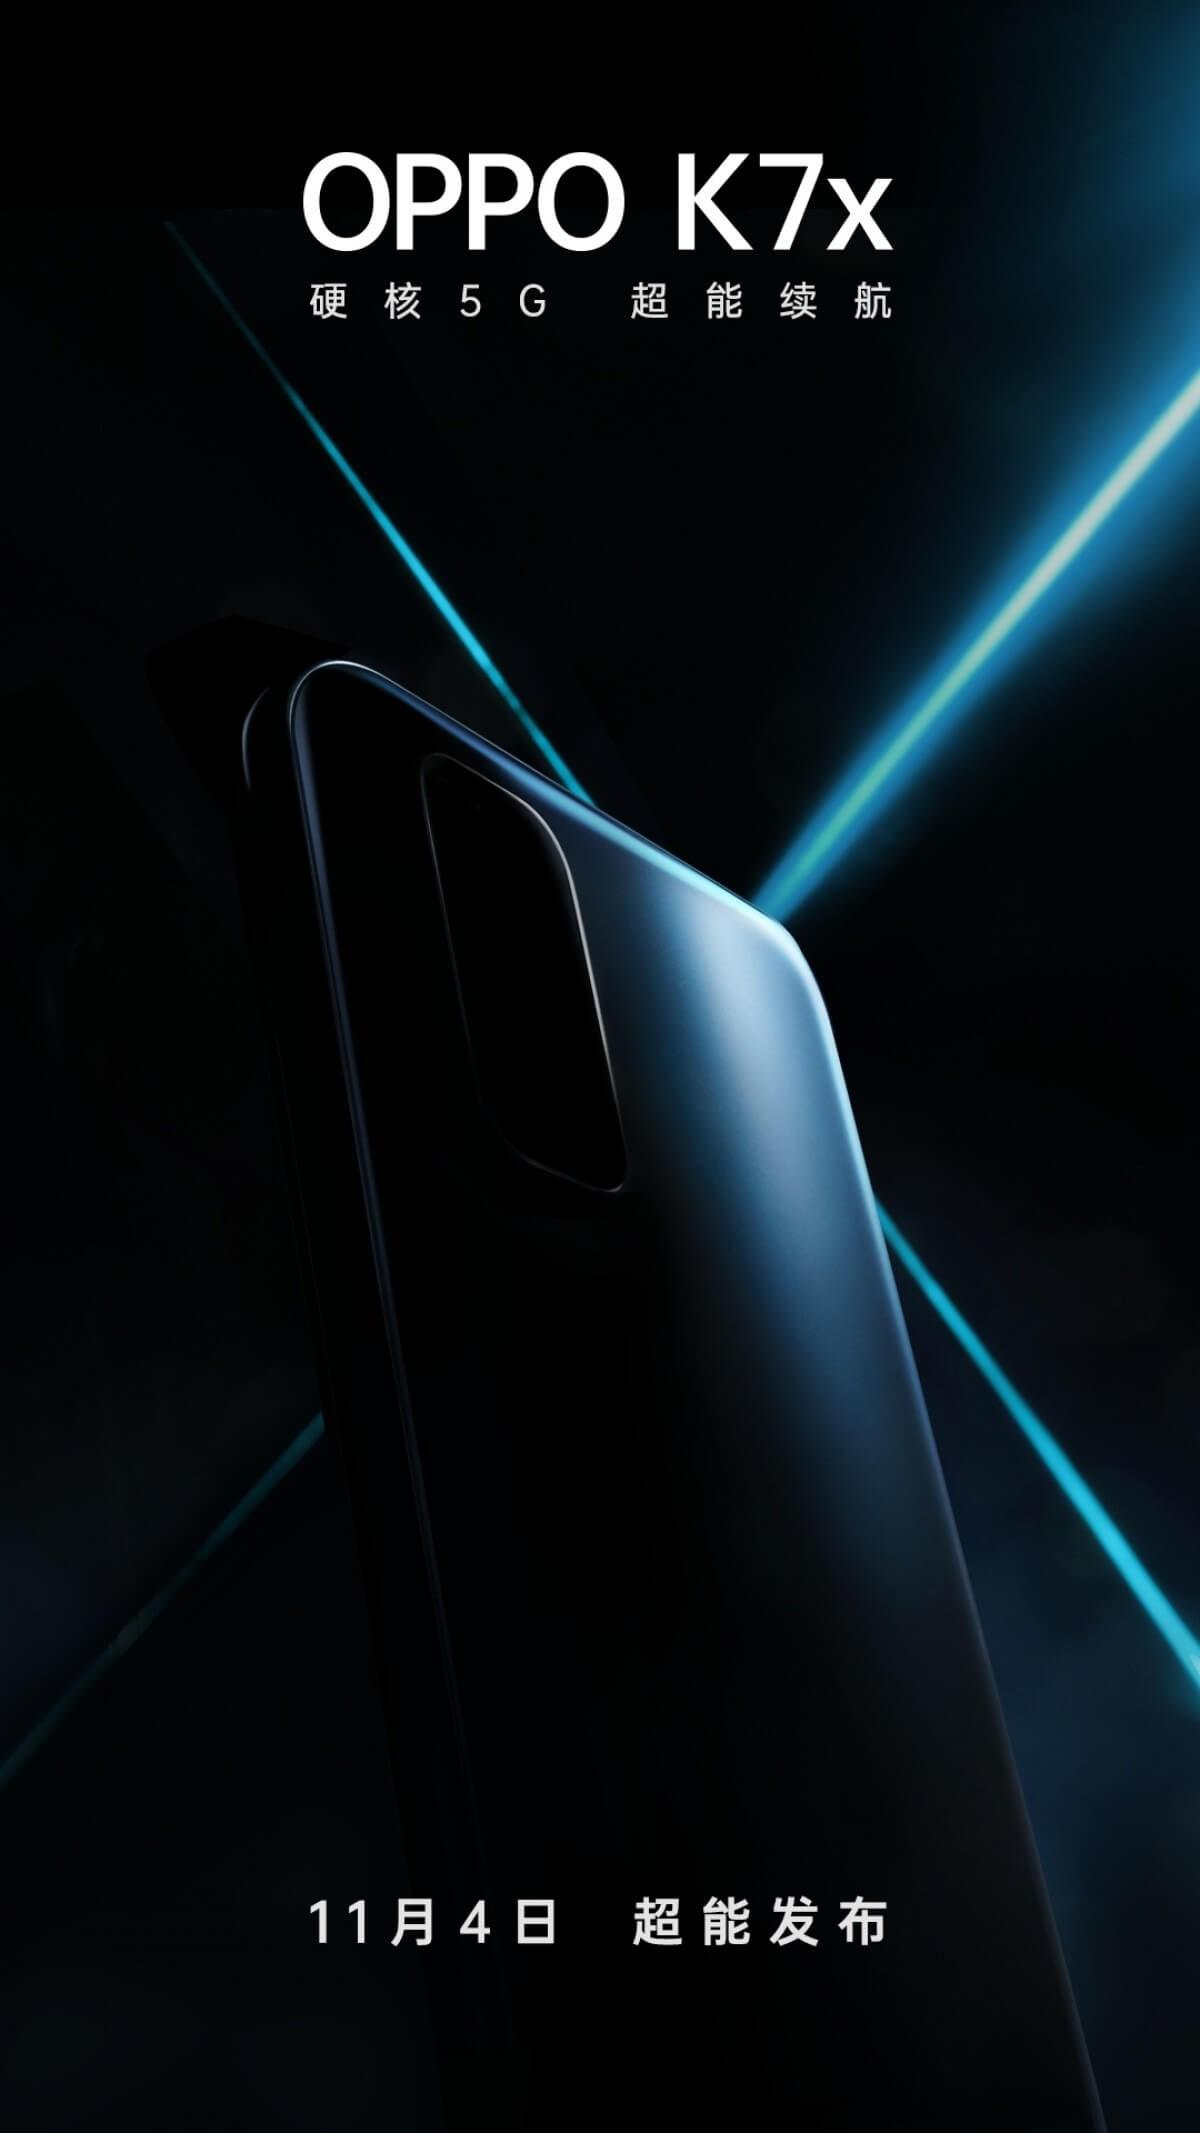 Oppo K7x 5G รุ่นระดับกลางใหม่เตรียมเปิดตัว 11 พฤศจิกายน นี้